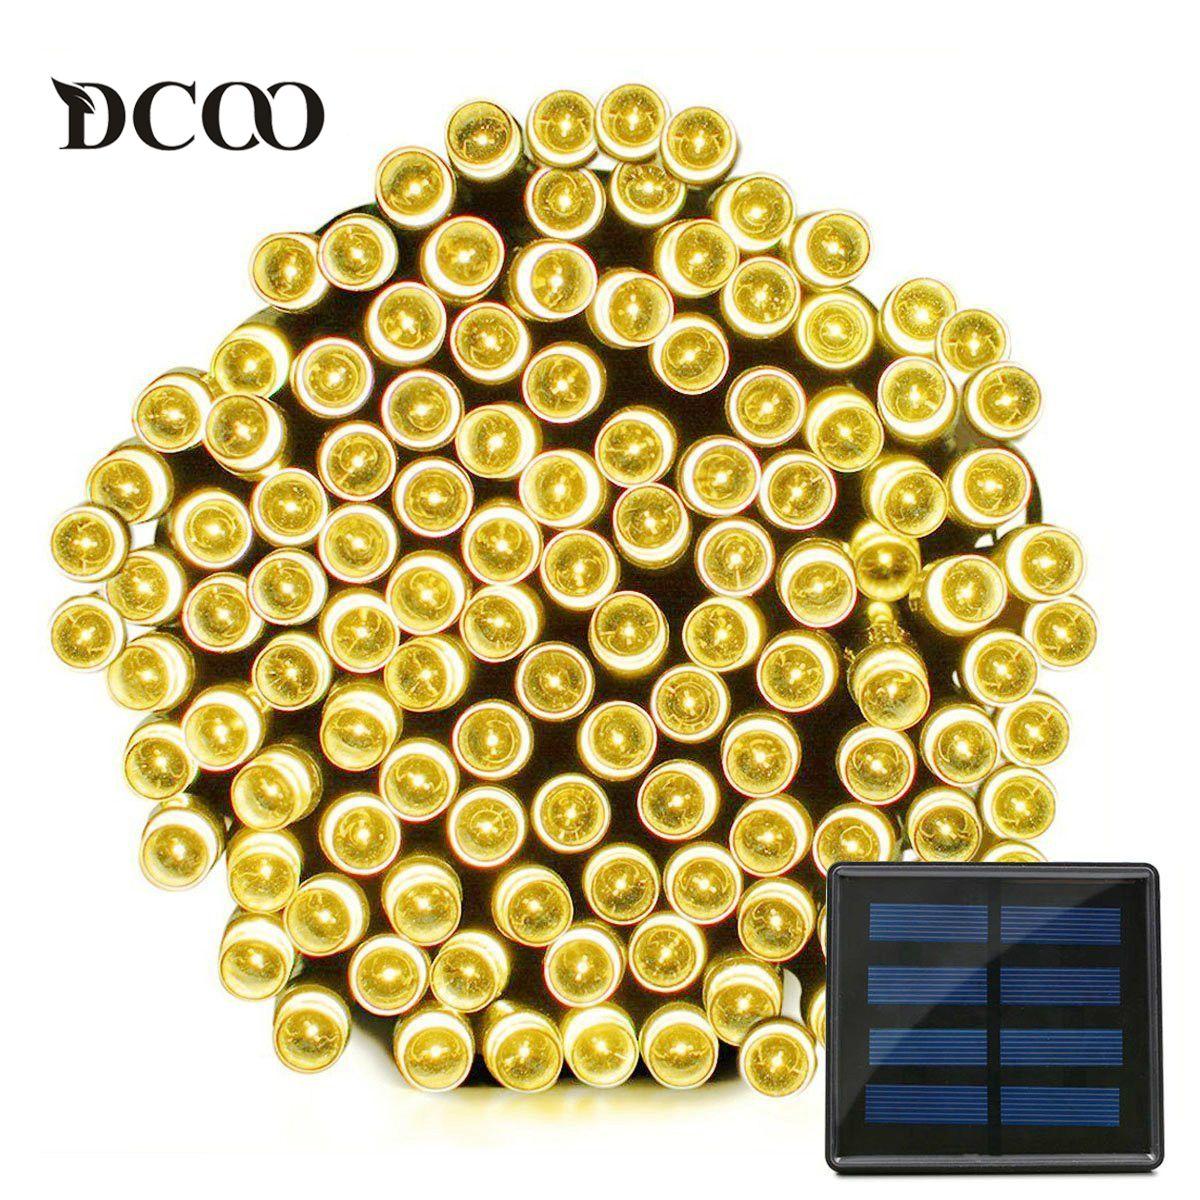 Dcoo Solar LED String Lights 22meter 200 LEDs Waterproof 8 Modes Fairy Christmas Lights Outdoor Lighitng <font><b>Garden</b></font> Party Lights